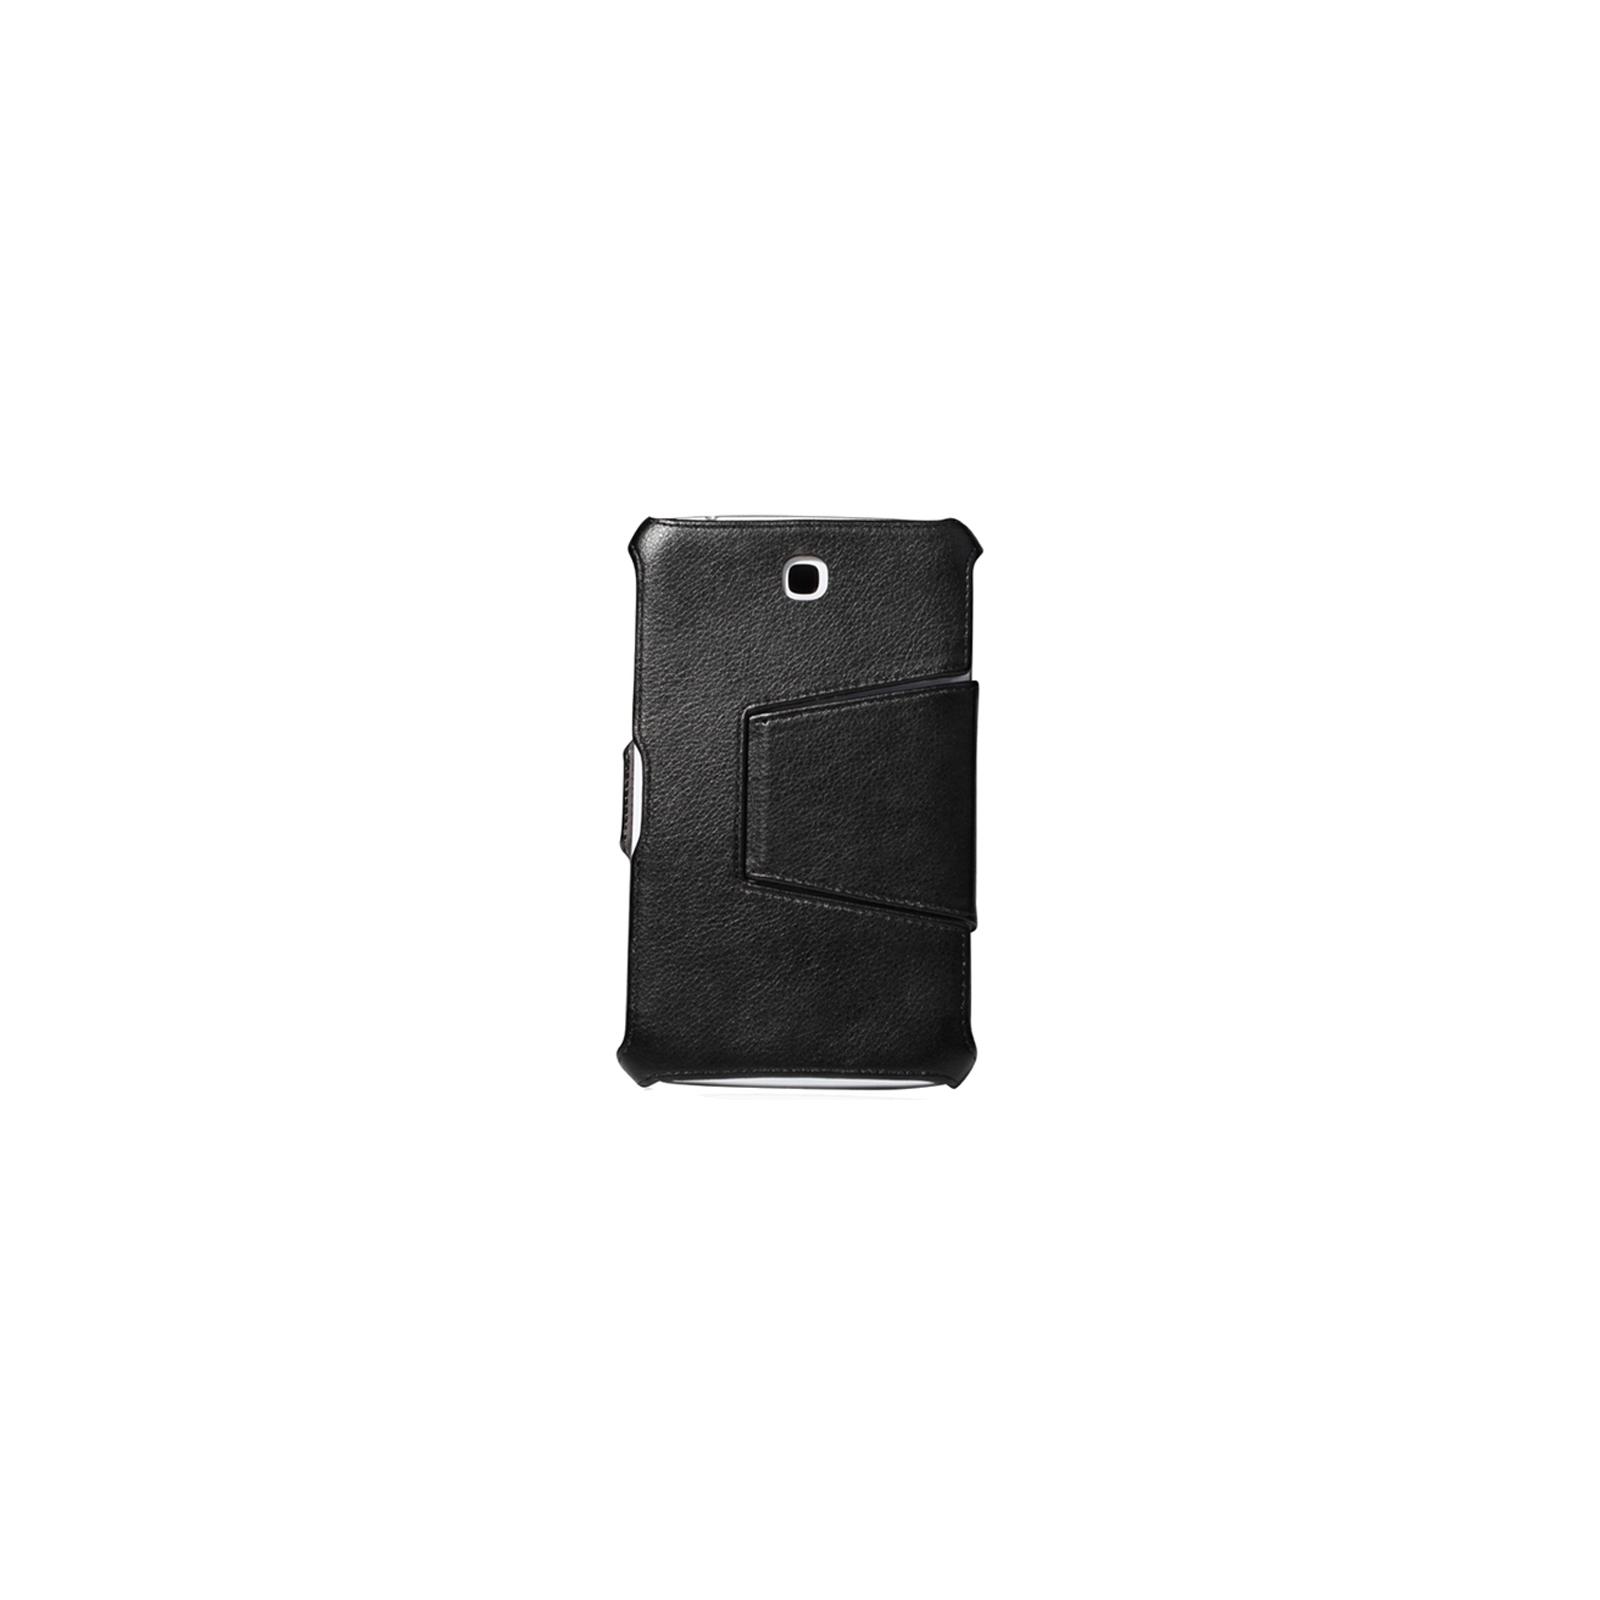 Чехол для планшета AirOn для Samsung Galaxy Tab 3 7'' black (6946795824954) изображение 5